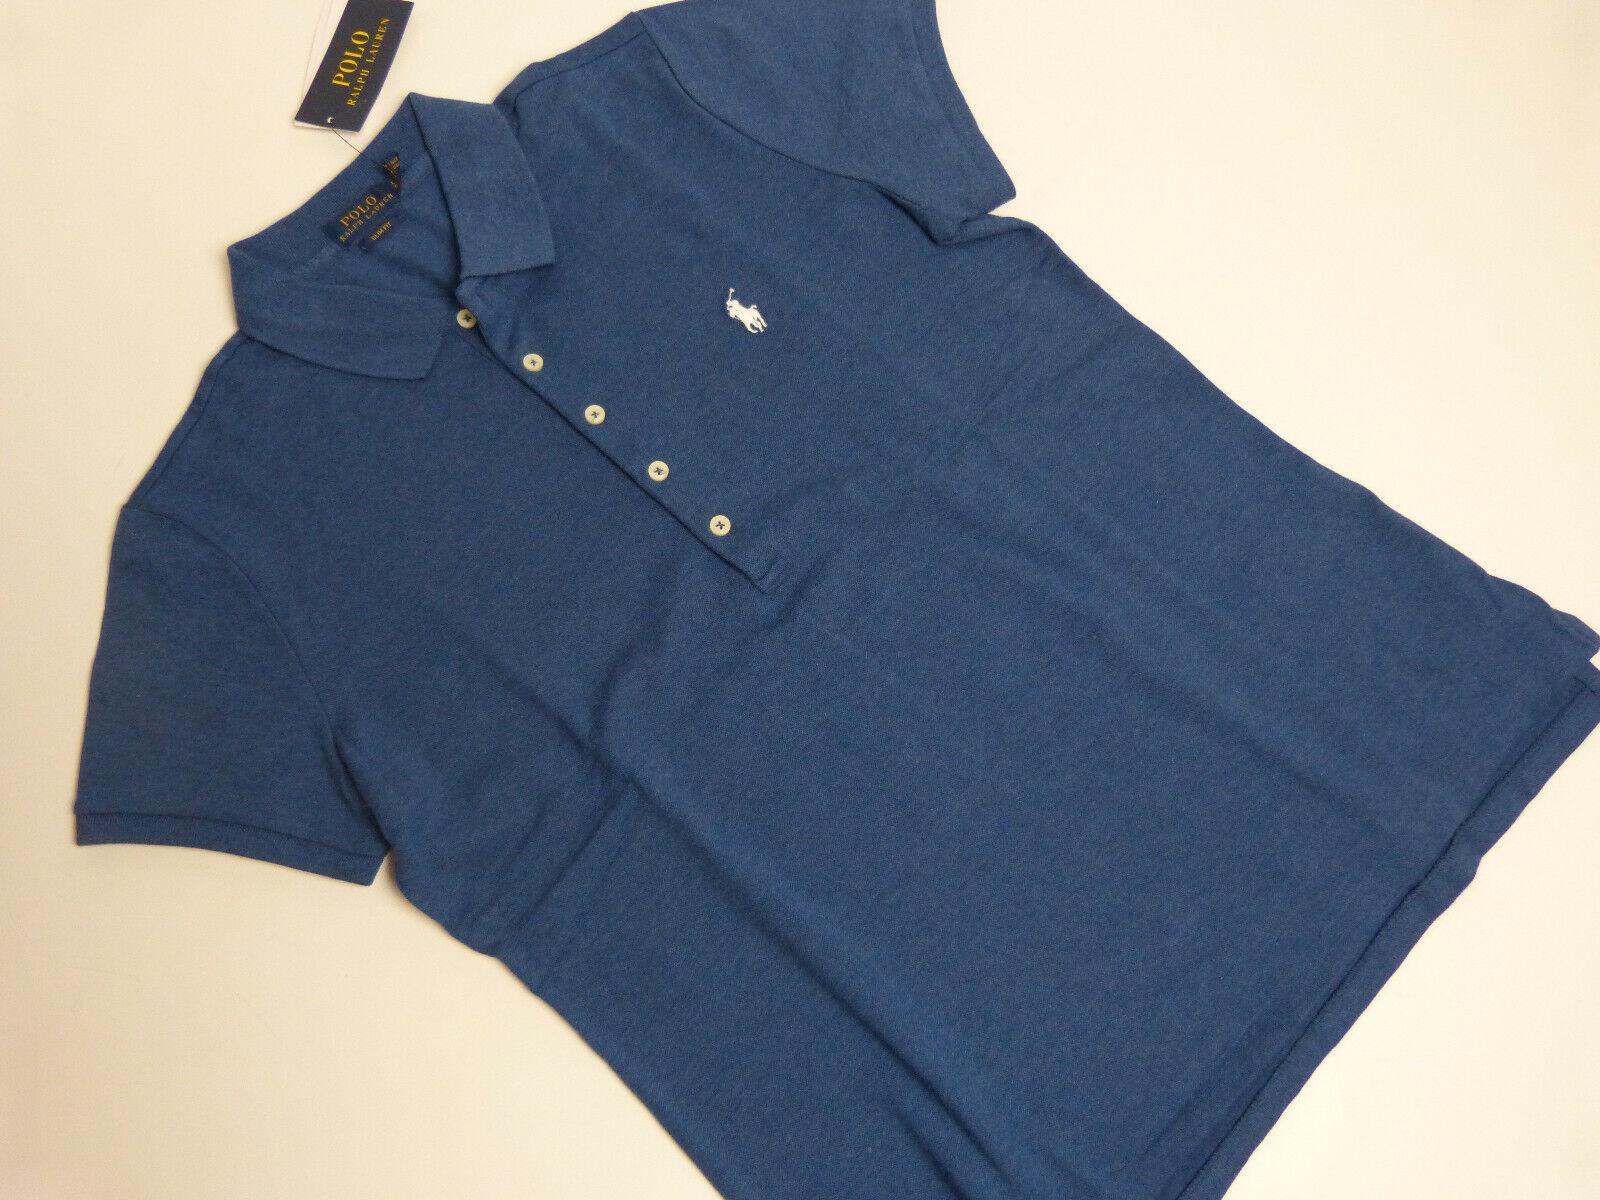 POLO Ralph Lauren Poloshirt Gr.L slim fit blau - Damen